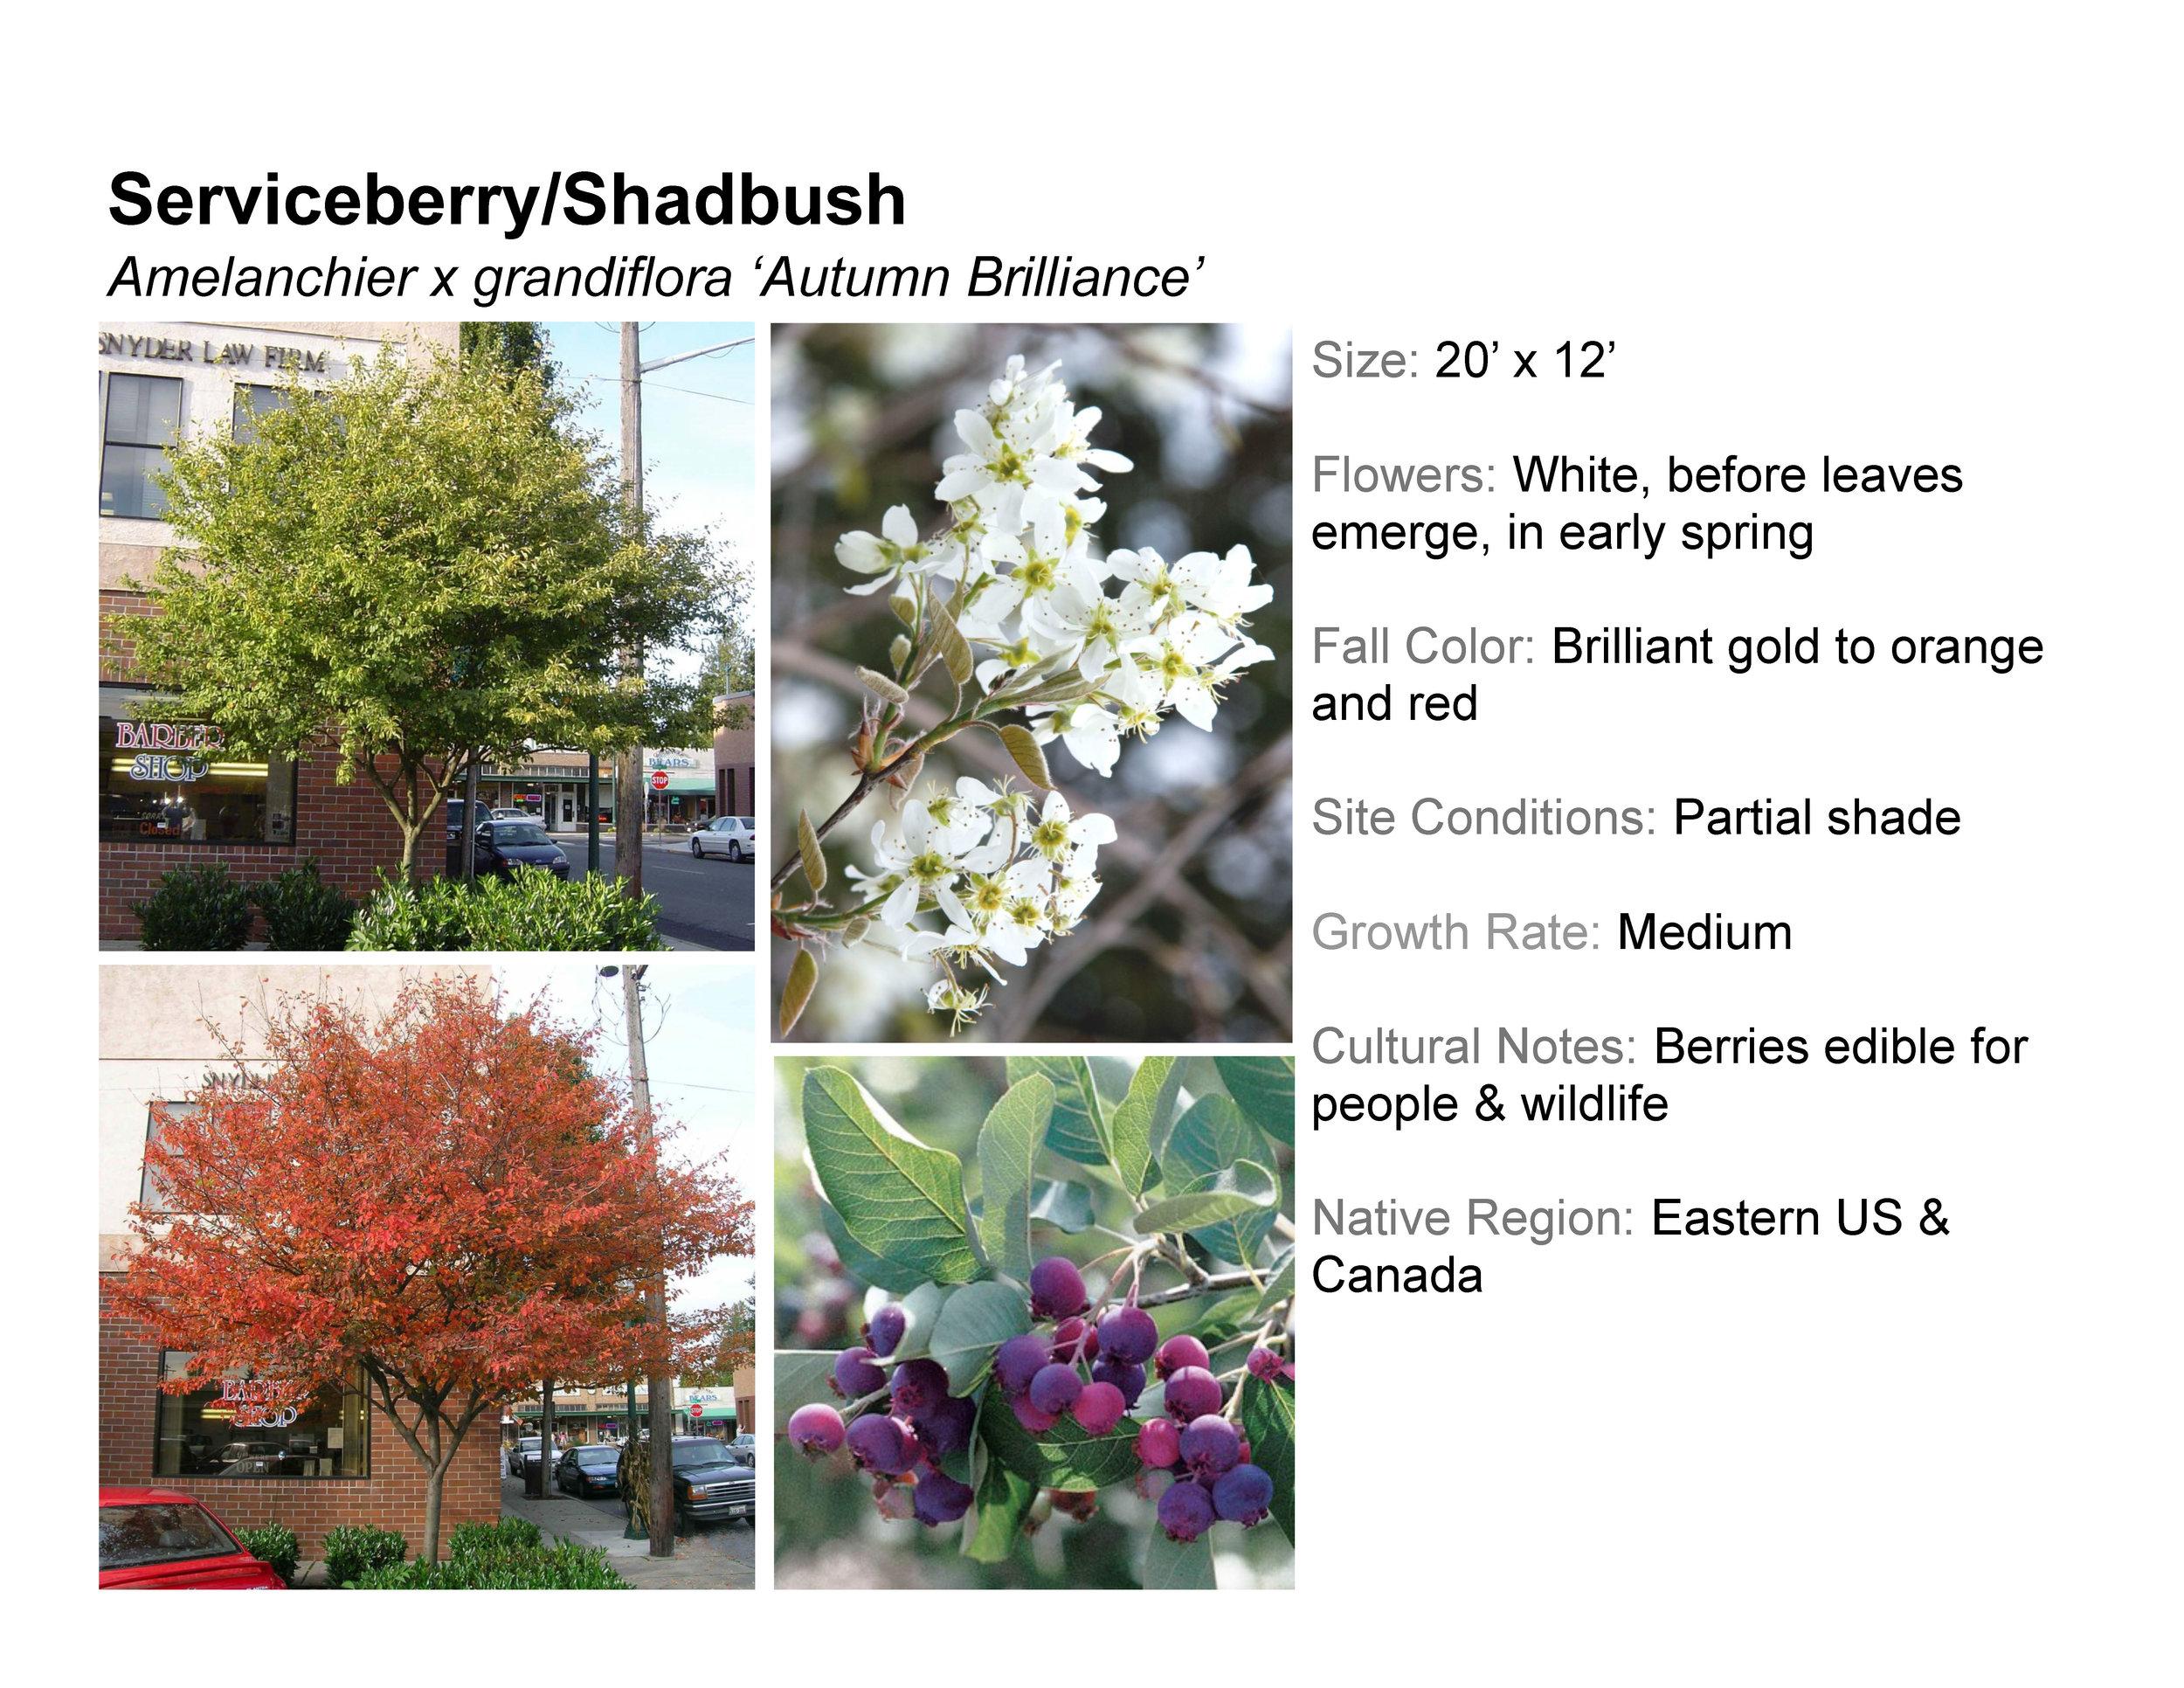 Serviceberry/Shadbush